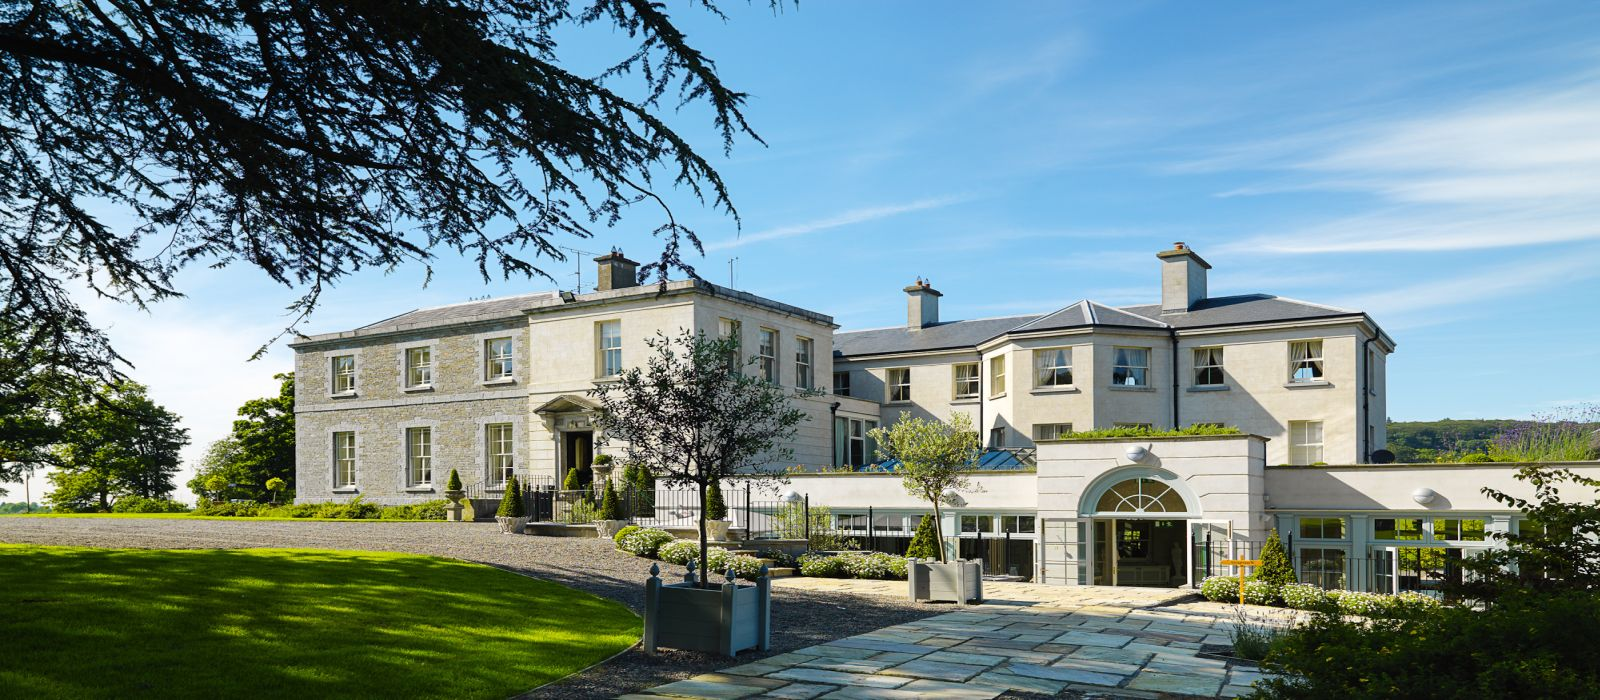 Tankardstown House Hotel Slane Co Meath Accomodation